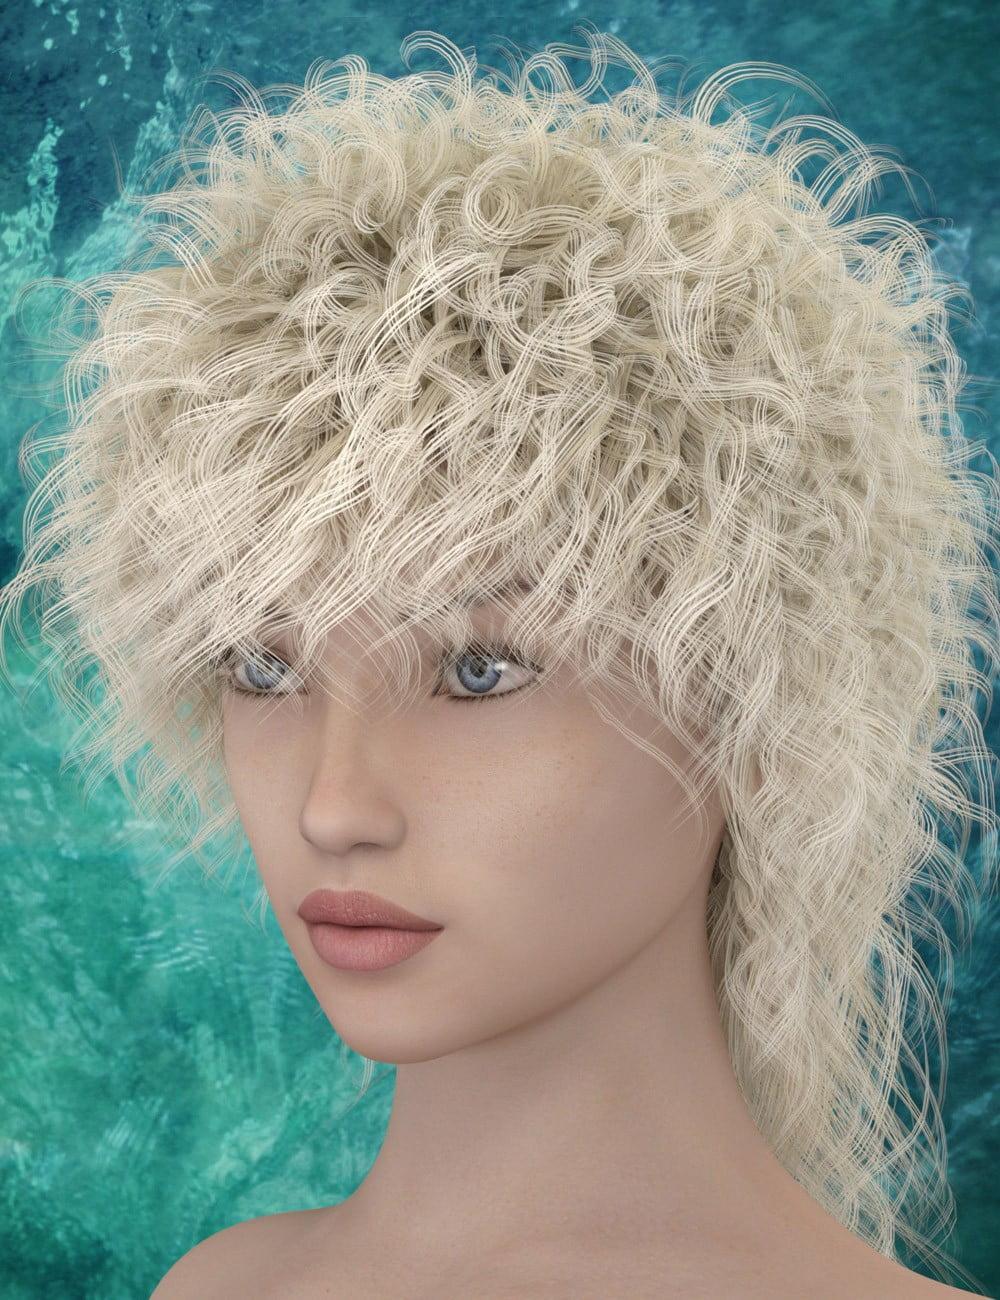 00-main-mairia-hair-for-genesis-3-females-and-males-daz3d